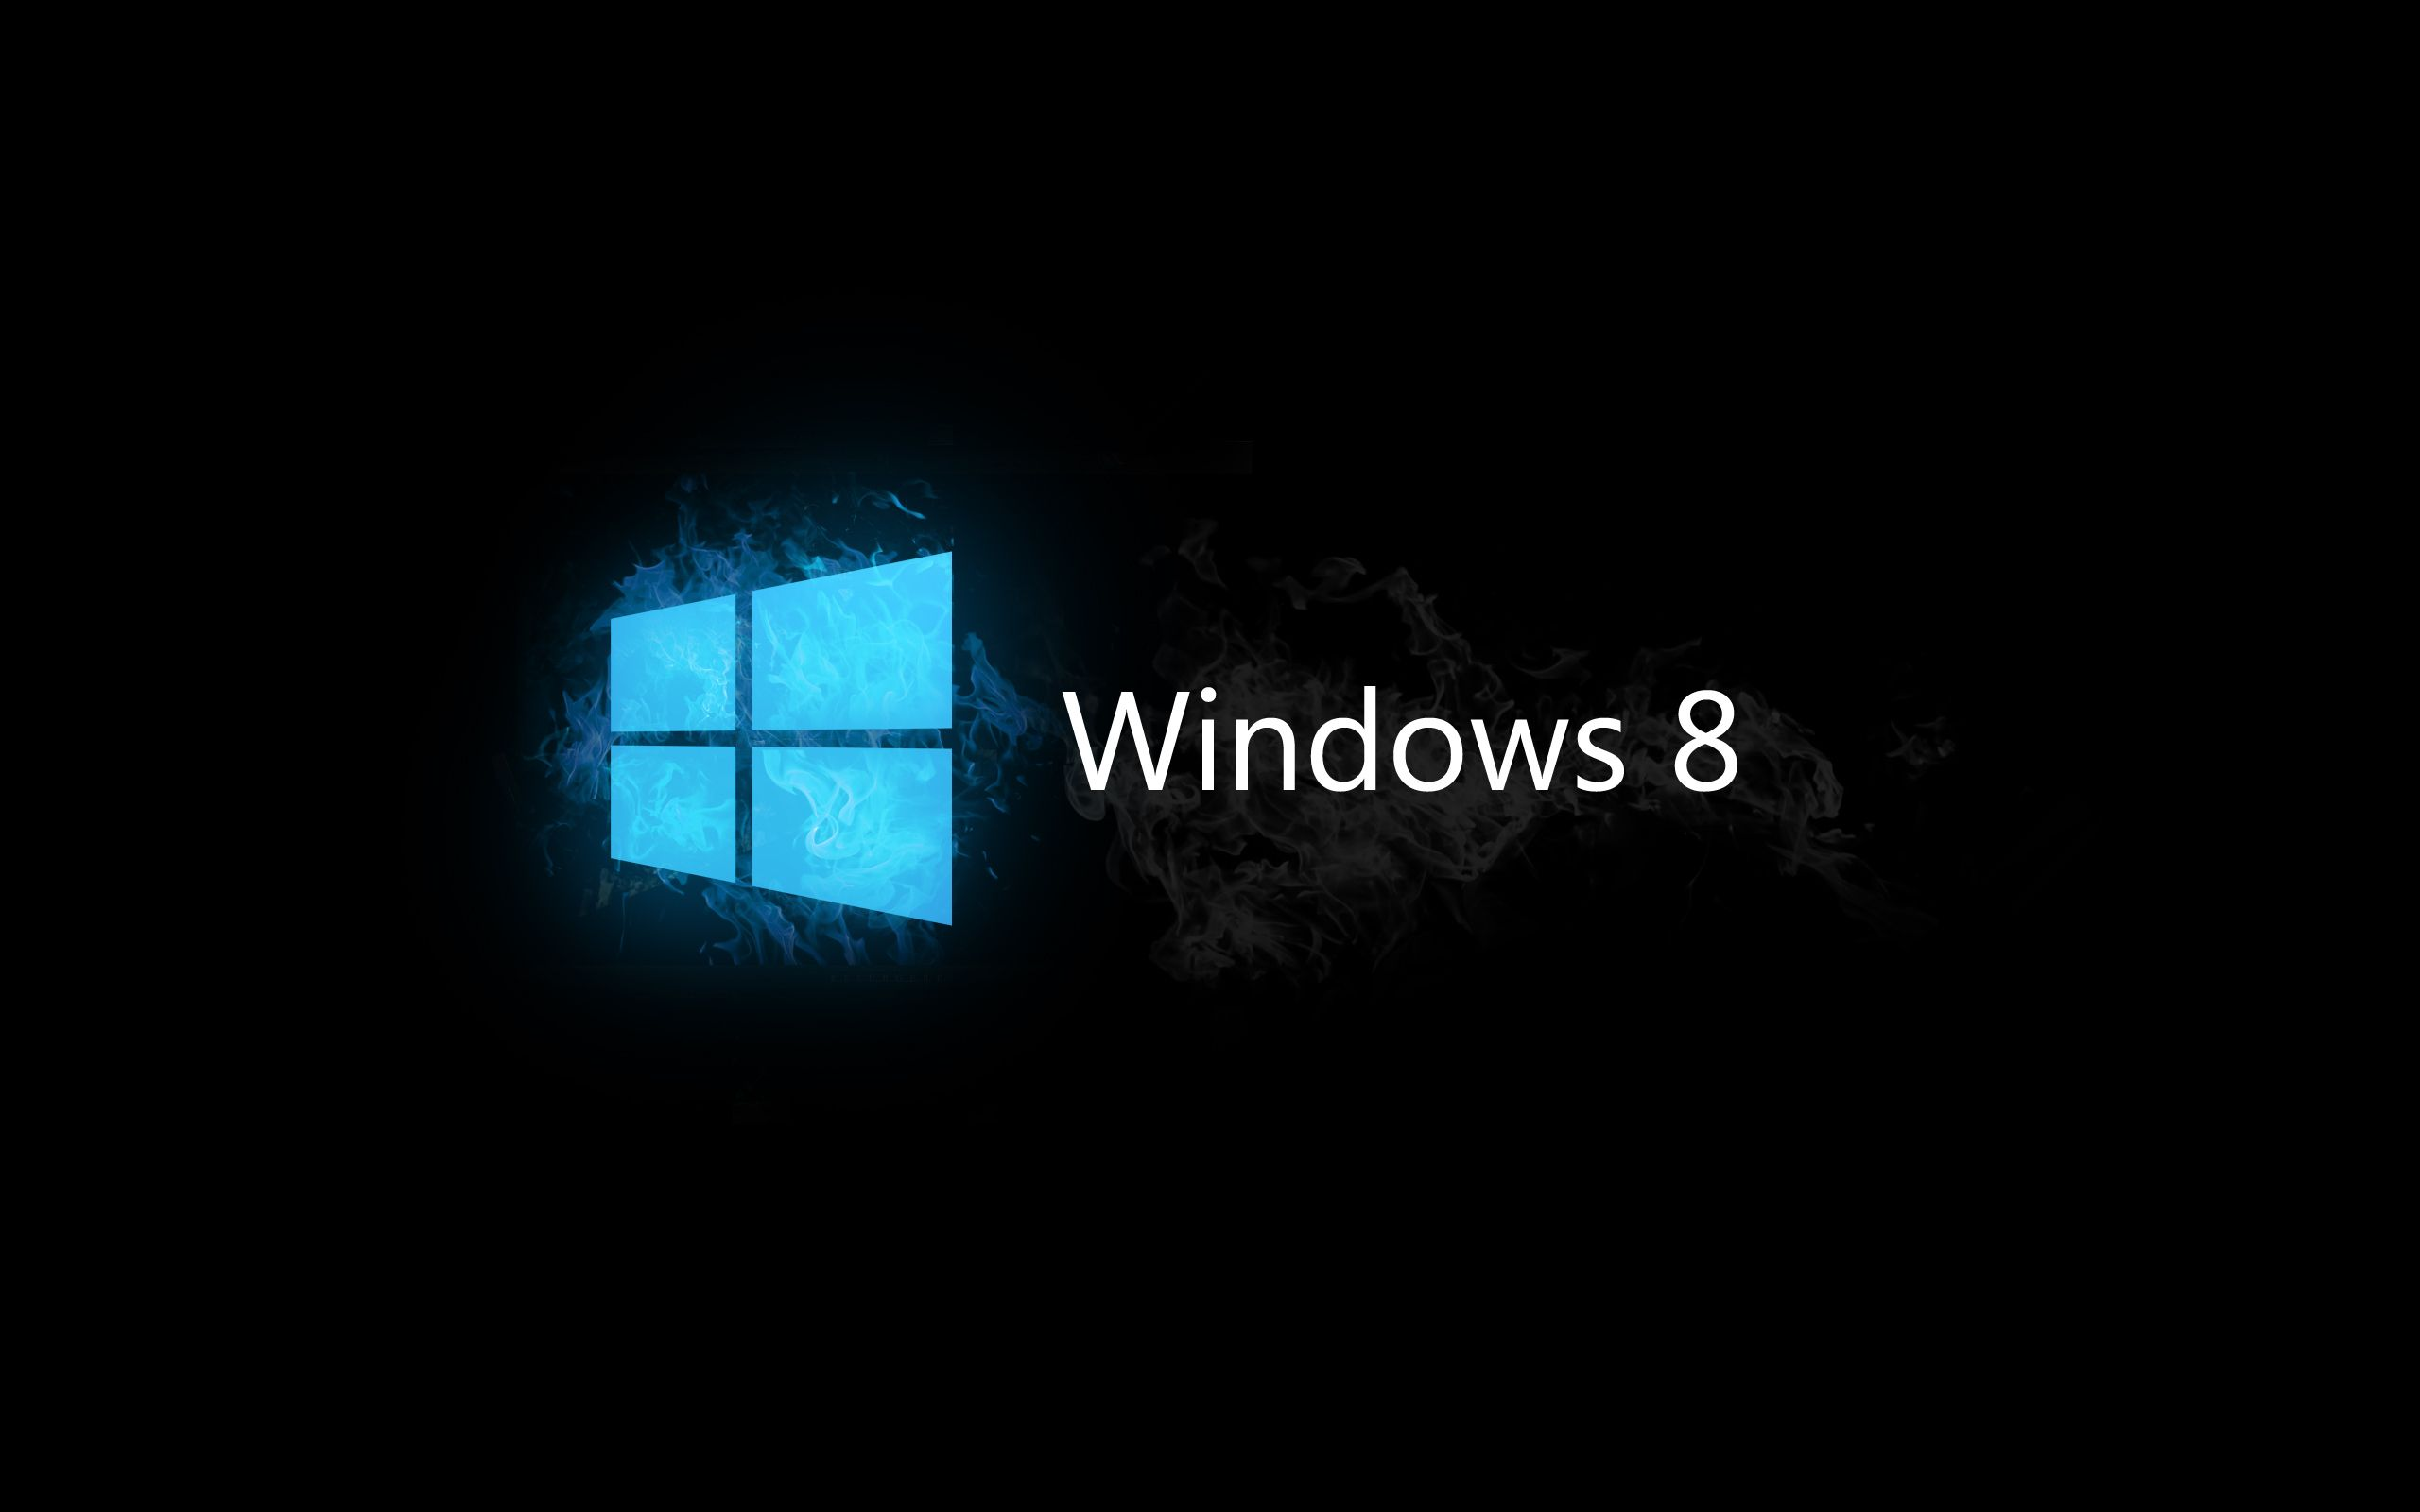 Windows 8 1 Disk Space Usage 2014 Images 2015 For You Windows Wallpaper Hd Wallpaper Desktop Windows 8